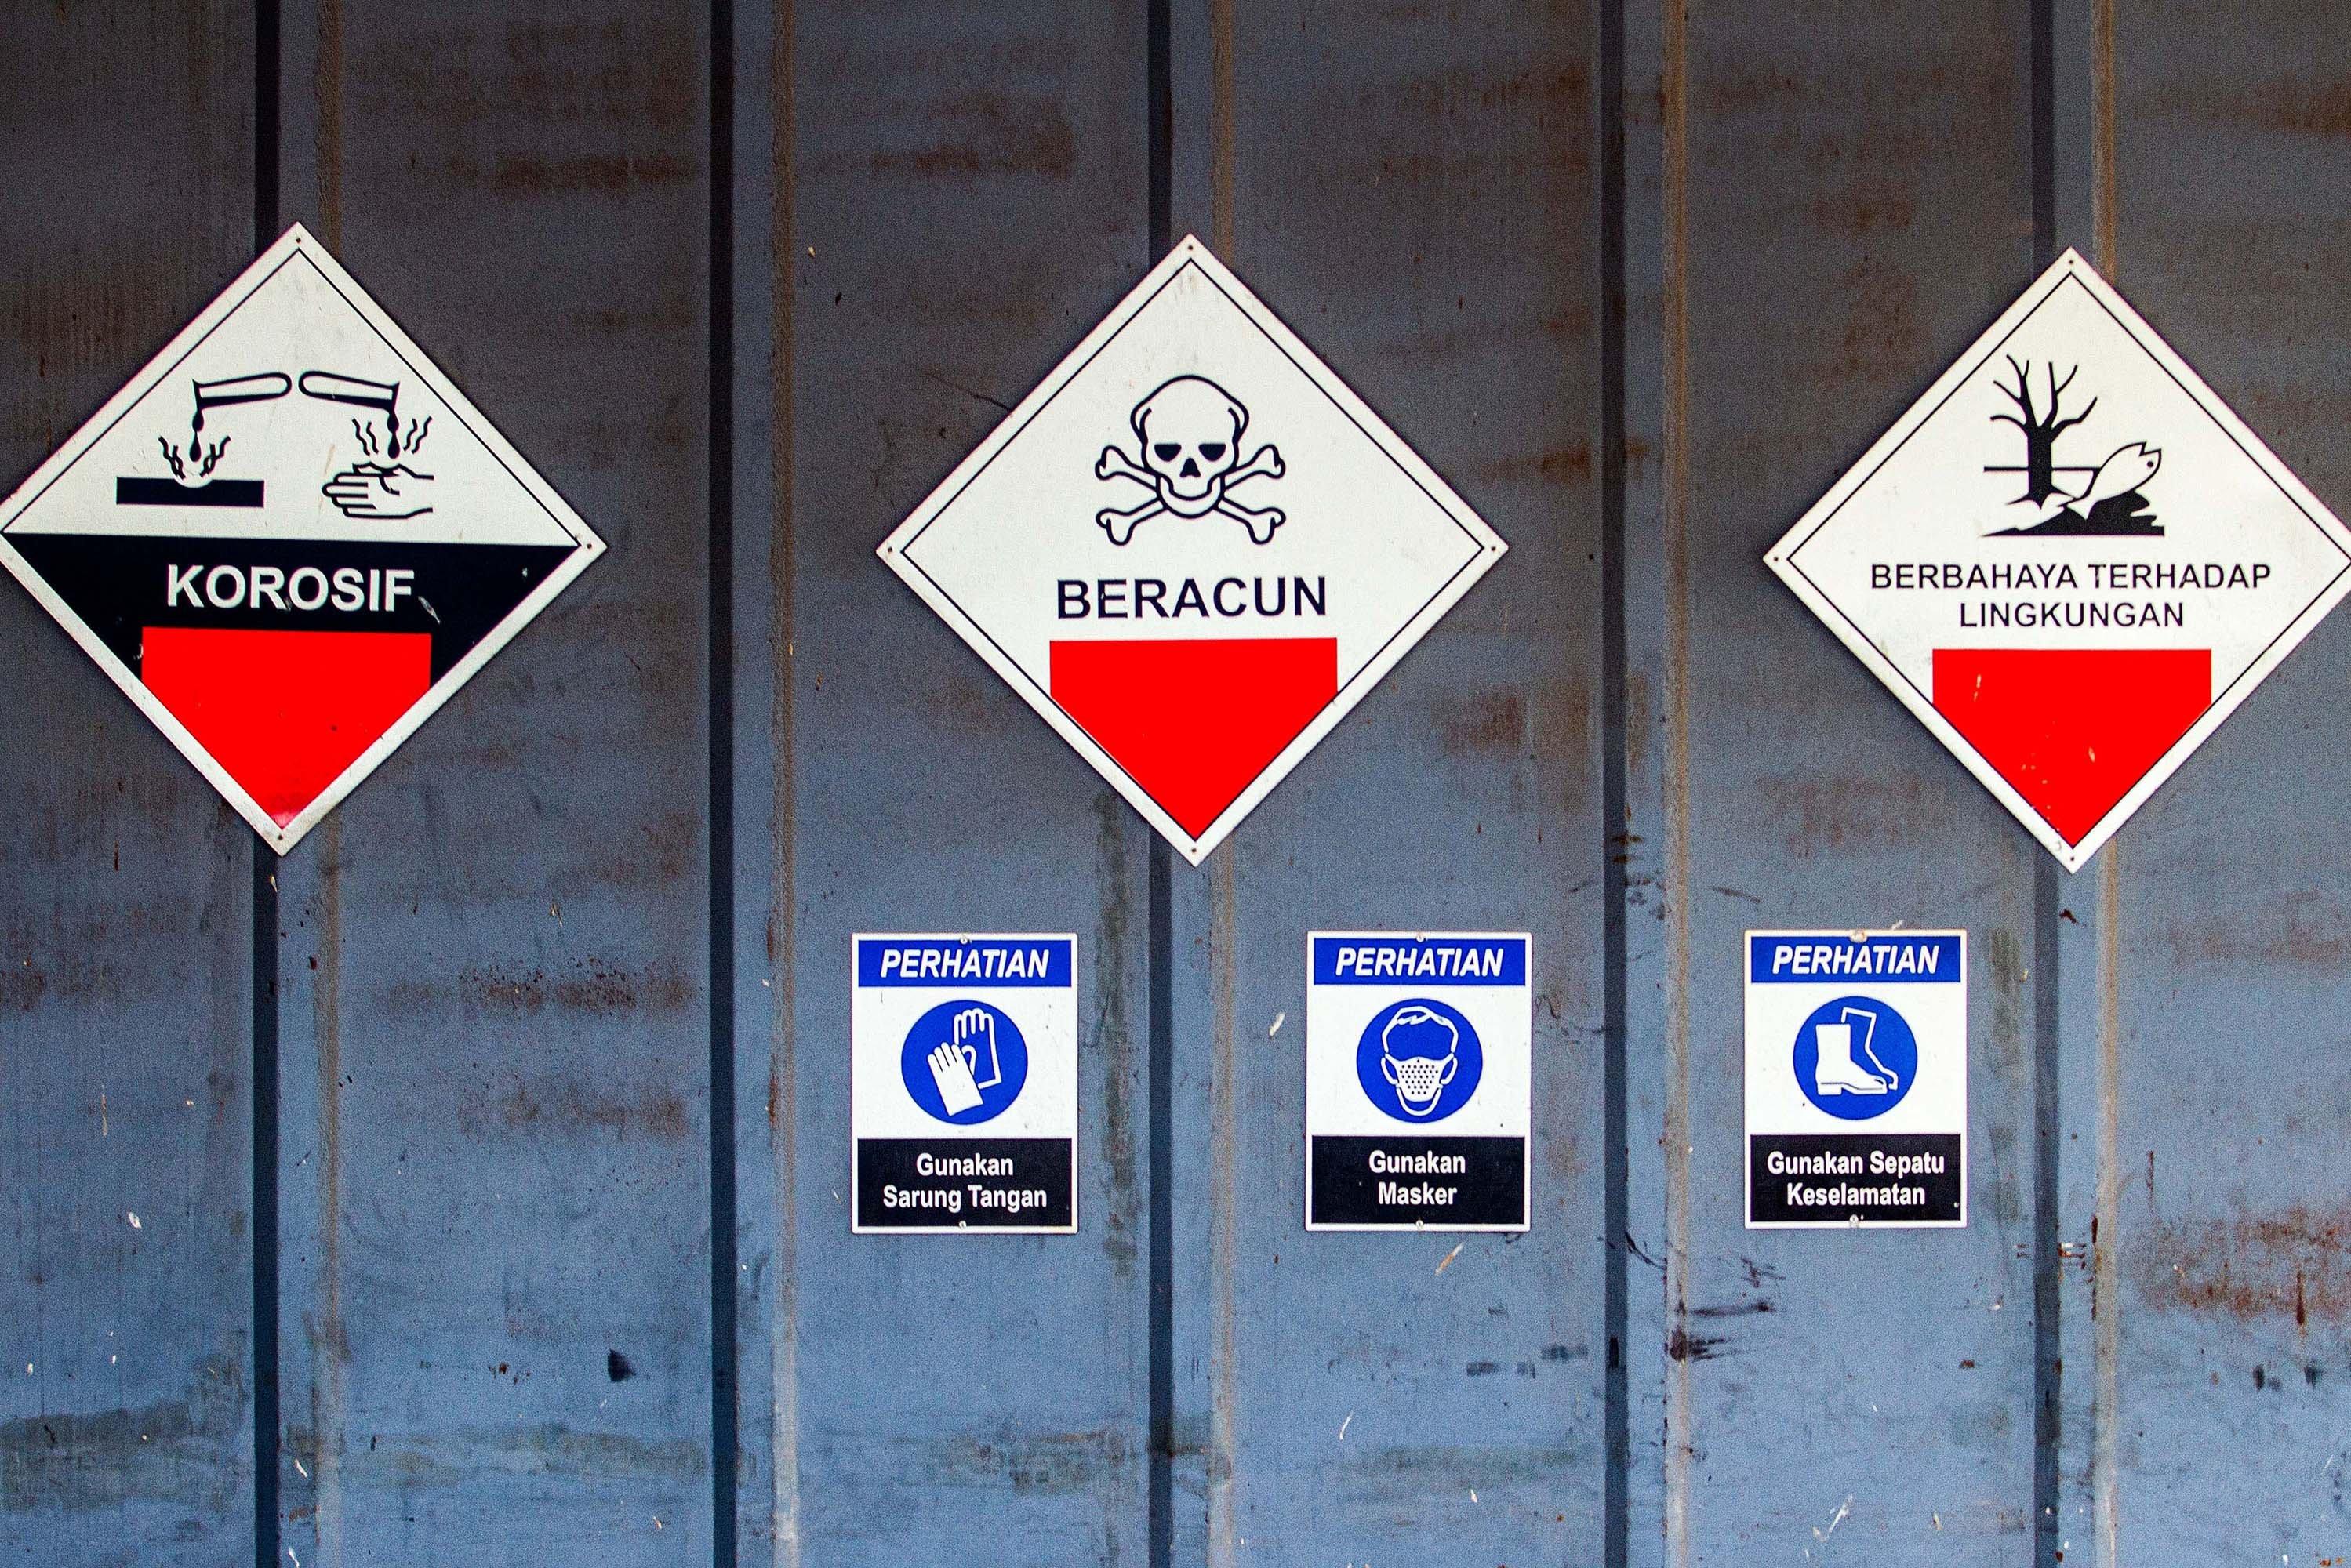 Tanda peringatan terpasang di gerbang tempat penyimpanan sementara residu atau abu hasil pembakaran limbah medis infeksius di PT Jasa Medivest, Plant Dawuan, Karawang, Jawa Barat.